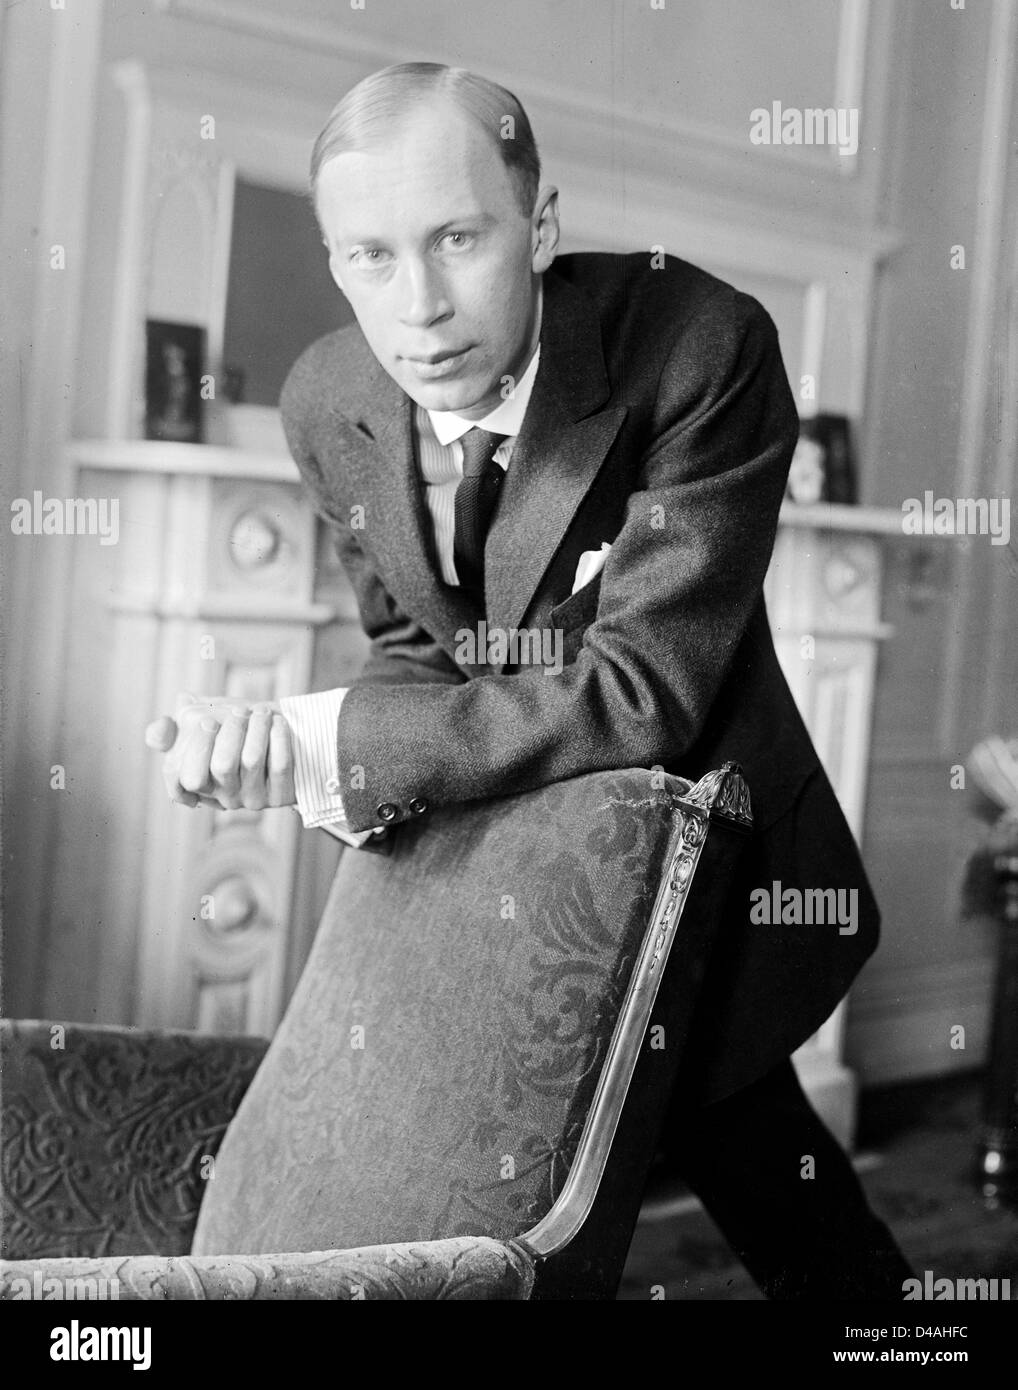 Prokofiev, Sergei Sergeyevich Prokofiev, Russian composer - Stock Image